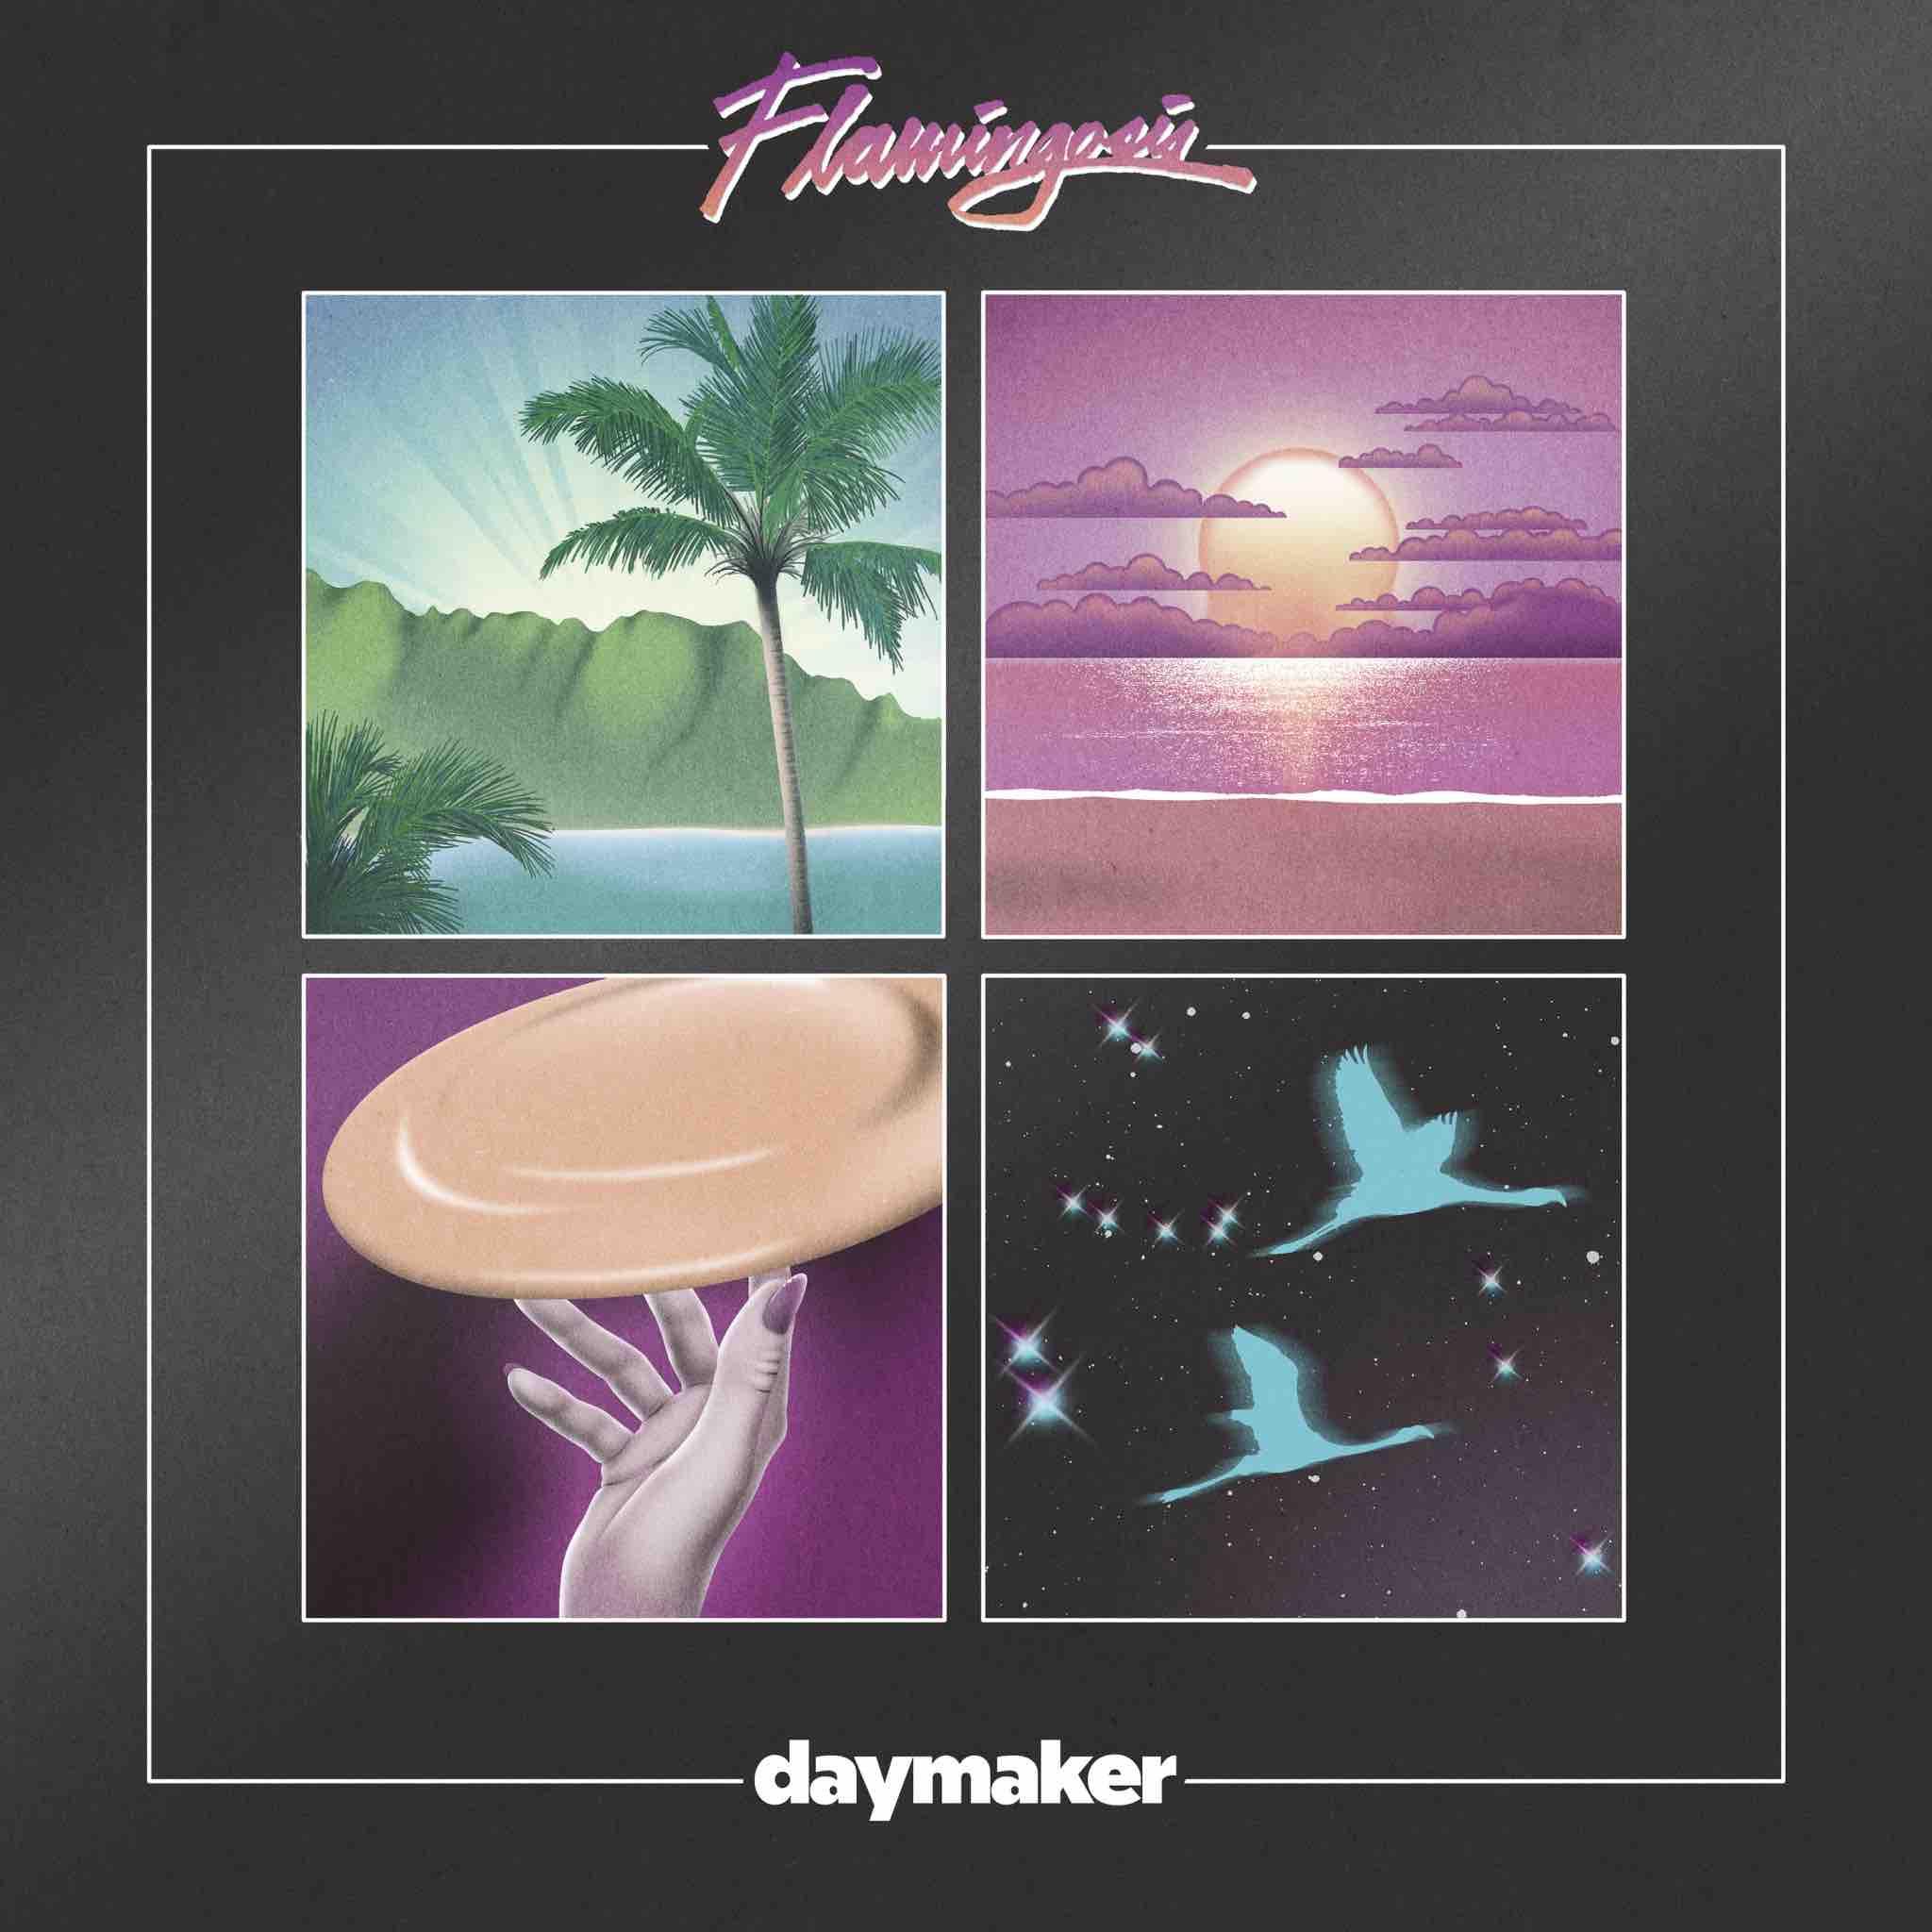 FLAMINGOSIS ANNOUNCES FULL-LENGTH ALBUM DAYMAKER